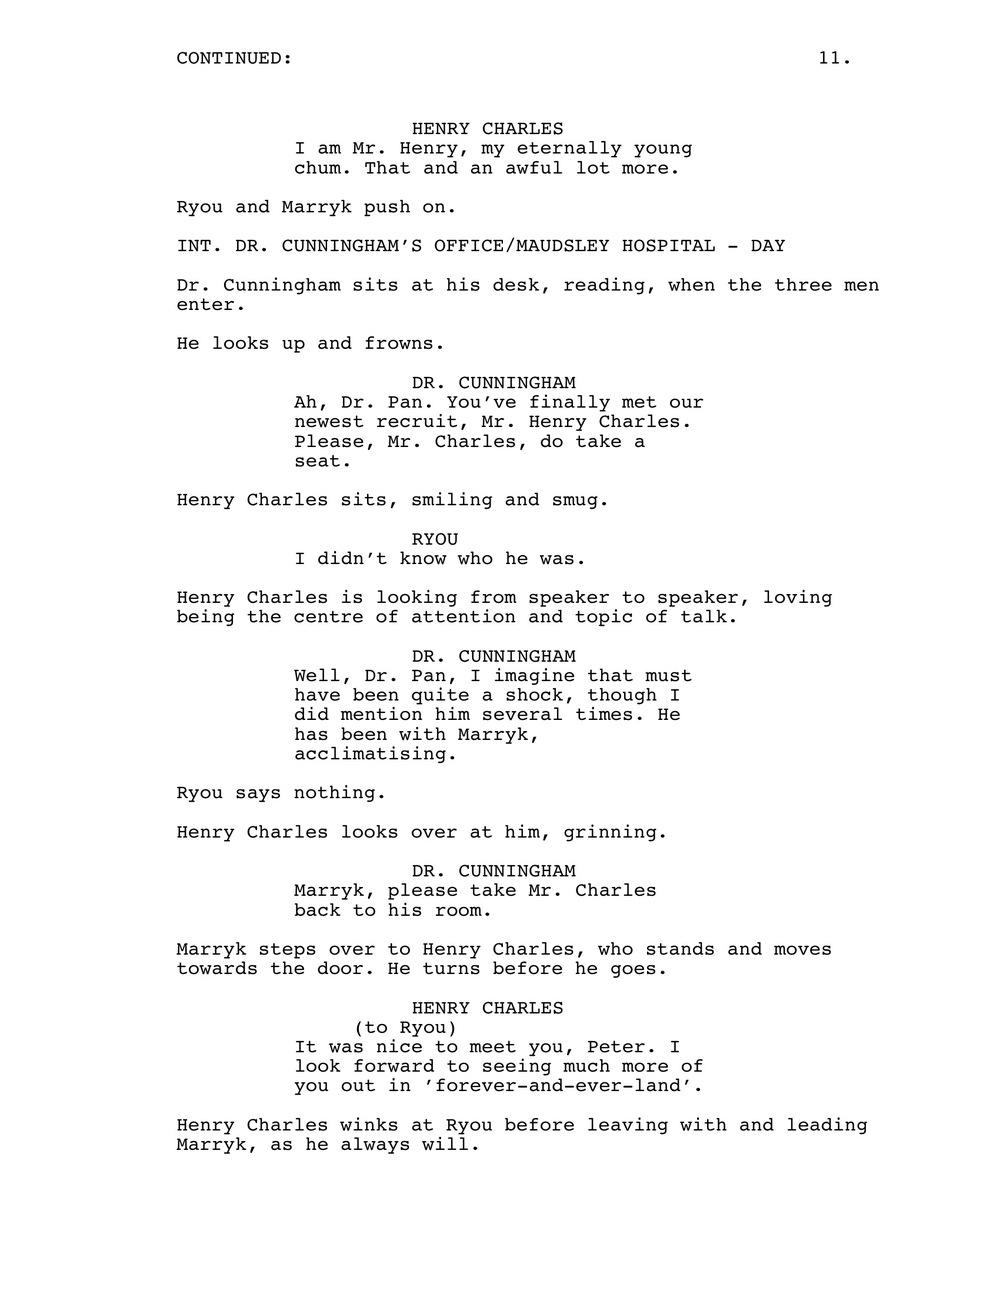 'Introducing Henry Charles' (Pilot) by Alexander Craig | 11.jpeg